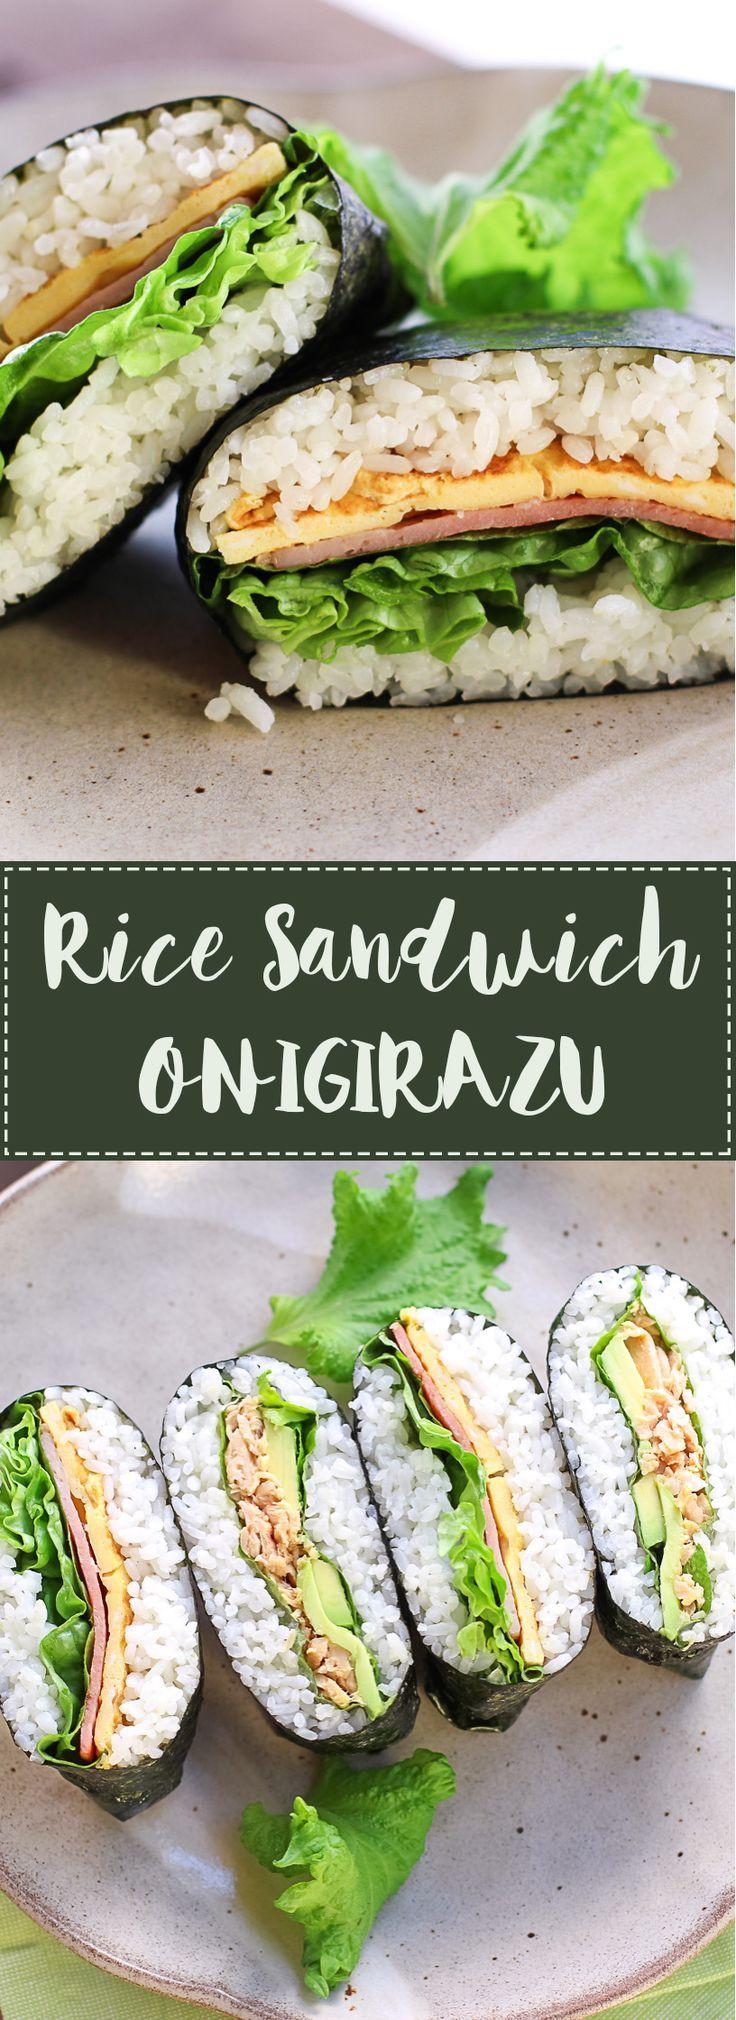 BLT Rice Sandwich-Onigirazu | WATCH for more ideas: https://www.youtube.com/watch?v=5kEd3vDtKNw | https://lomejordelaweb.es/